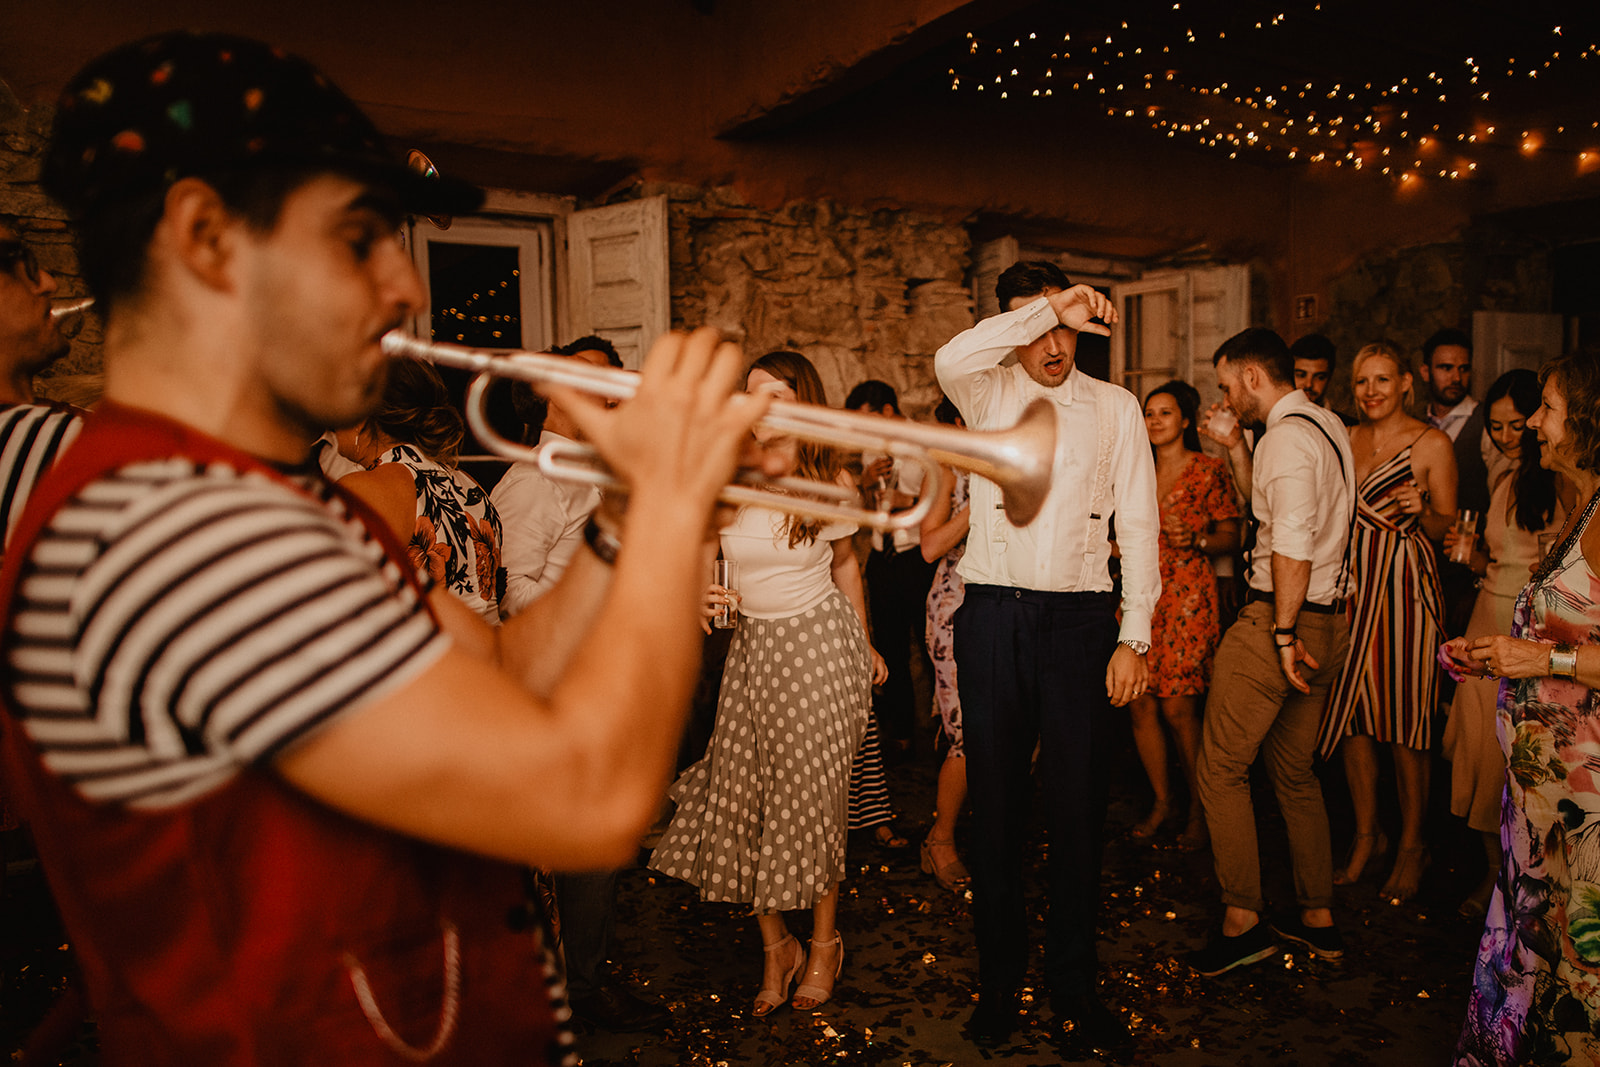 Lapela-photography-wedding-algarve-portugal-best-of-37.jpg